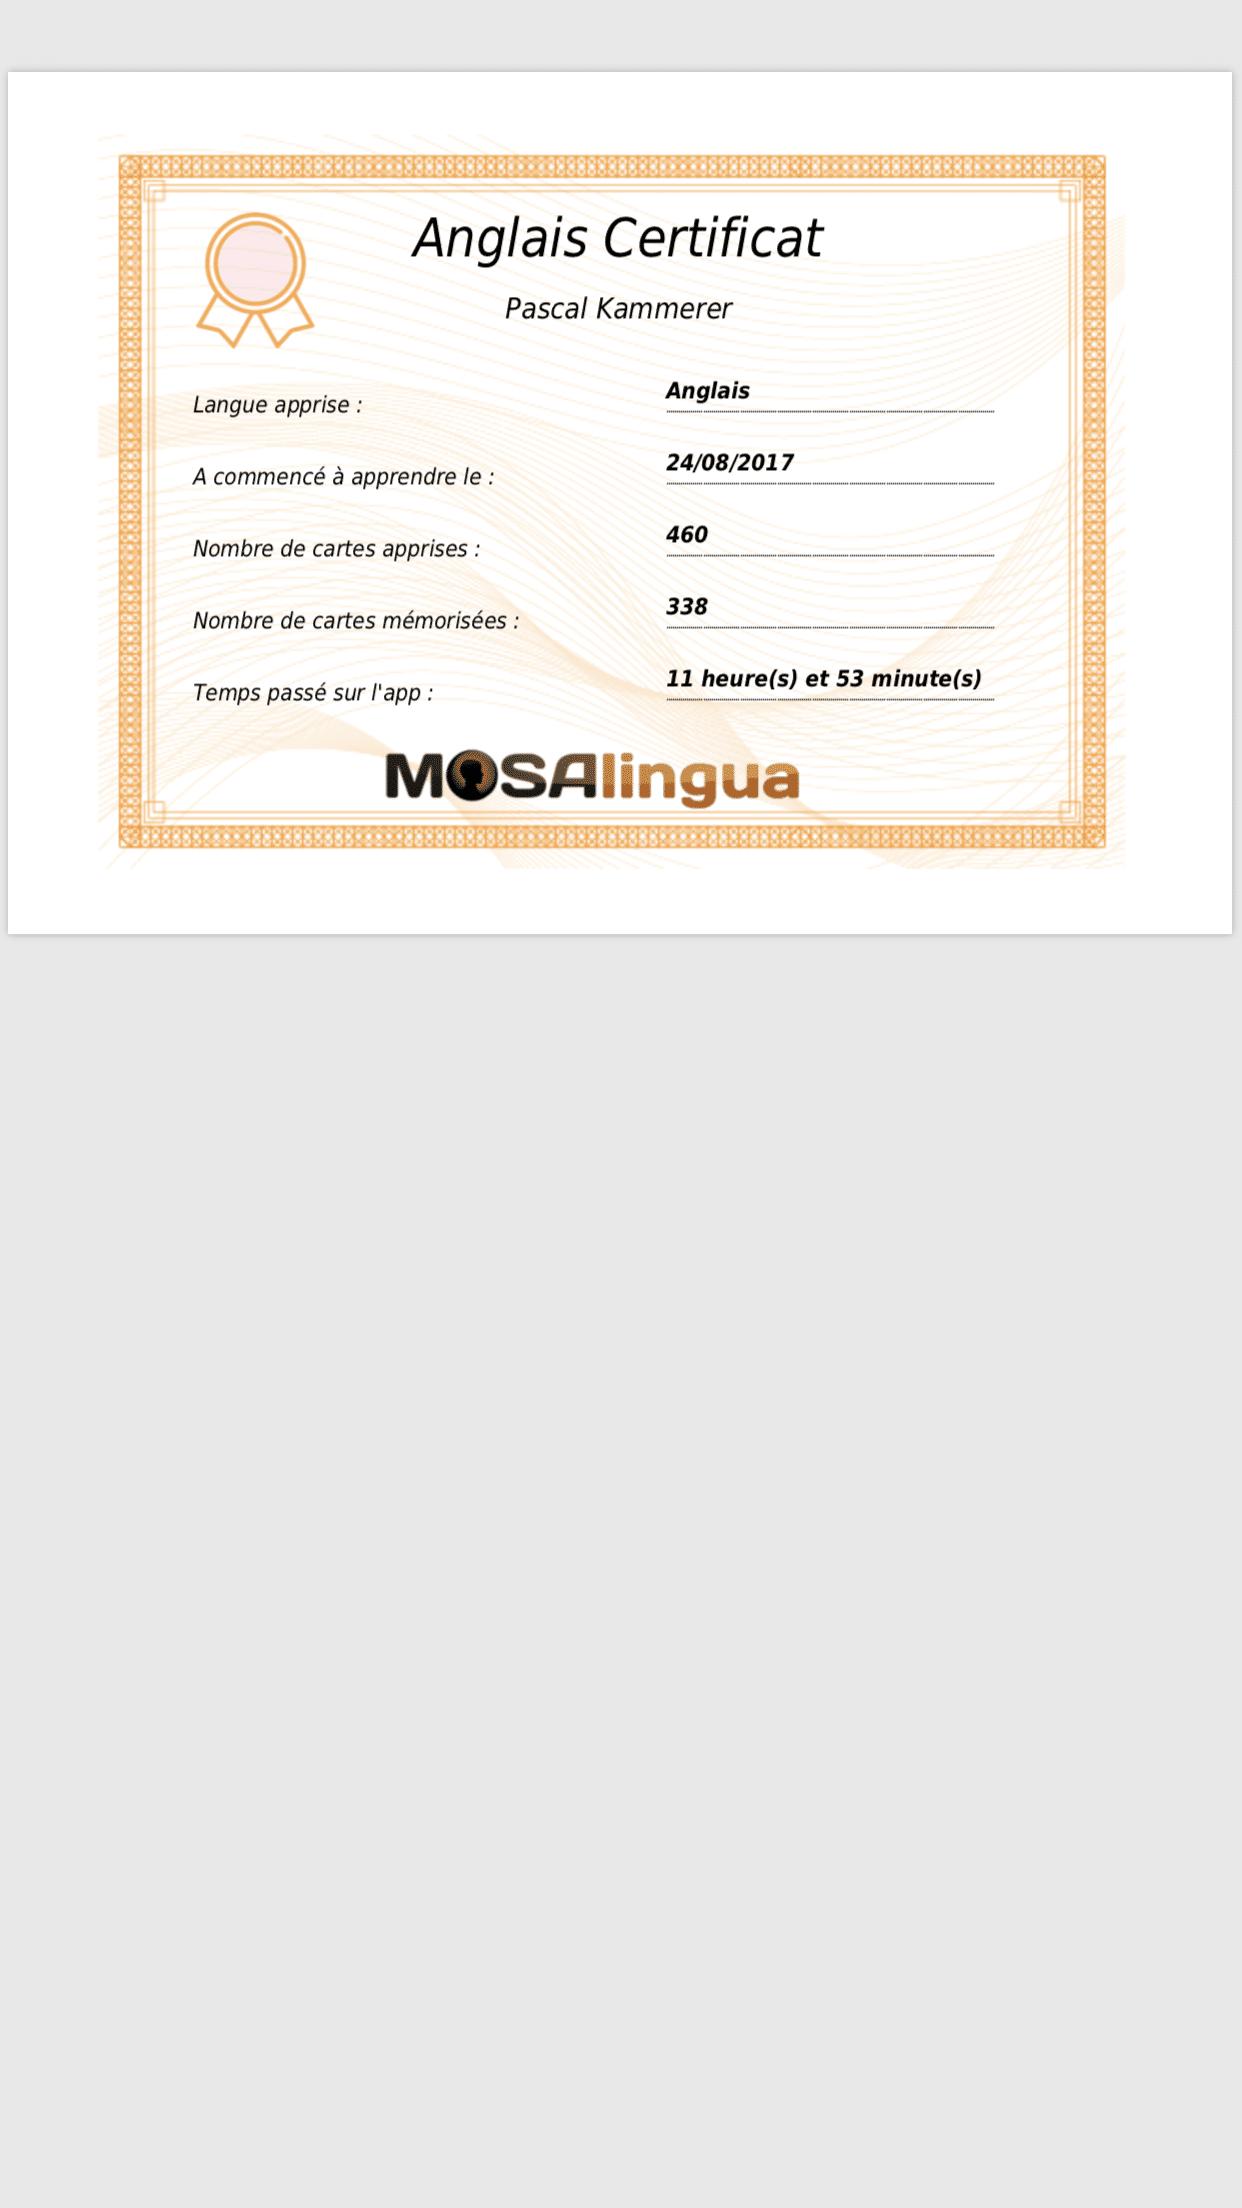 Mosalingua certificat